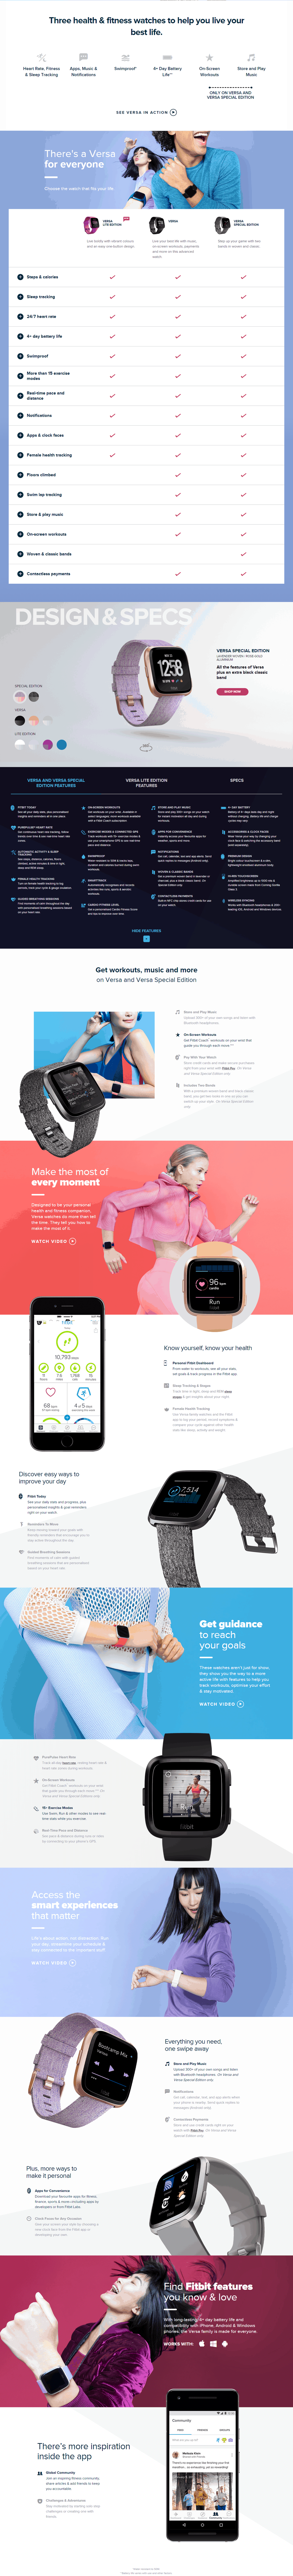 Fitbit Versa Health and Fitness Smartwatch, Onesize (Black) (Unisex)